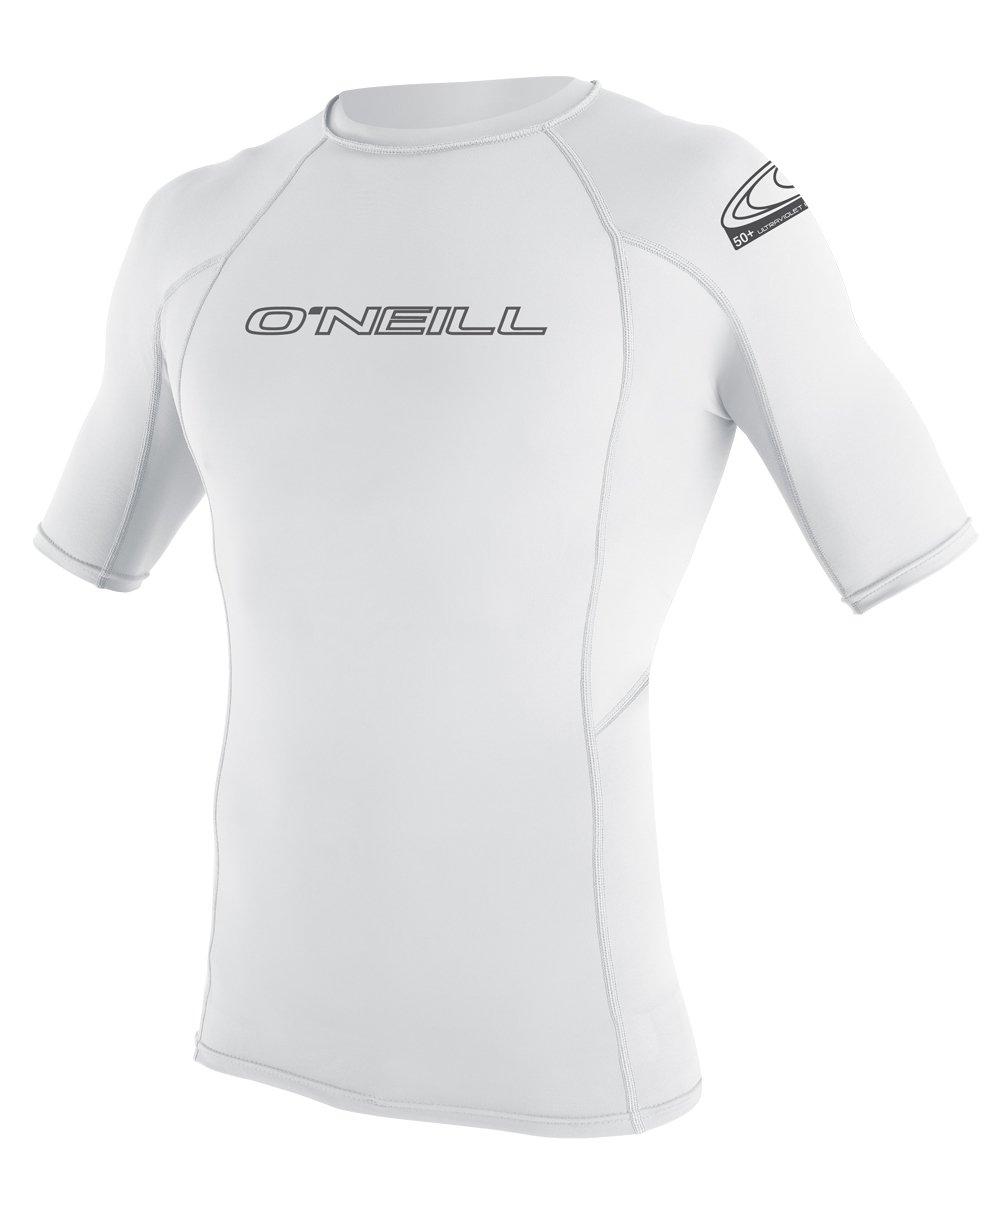 O'Neill  Men's Basic Skins UPF 50+ Short Sleeve Rash Guard, White, Small